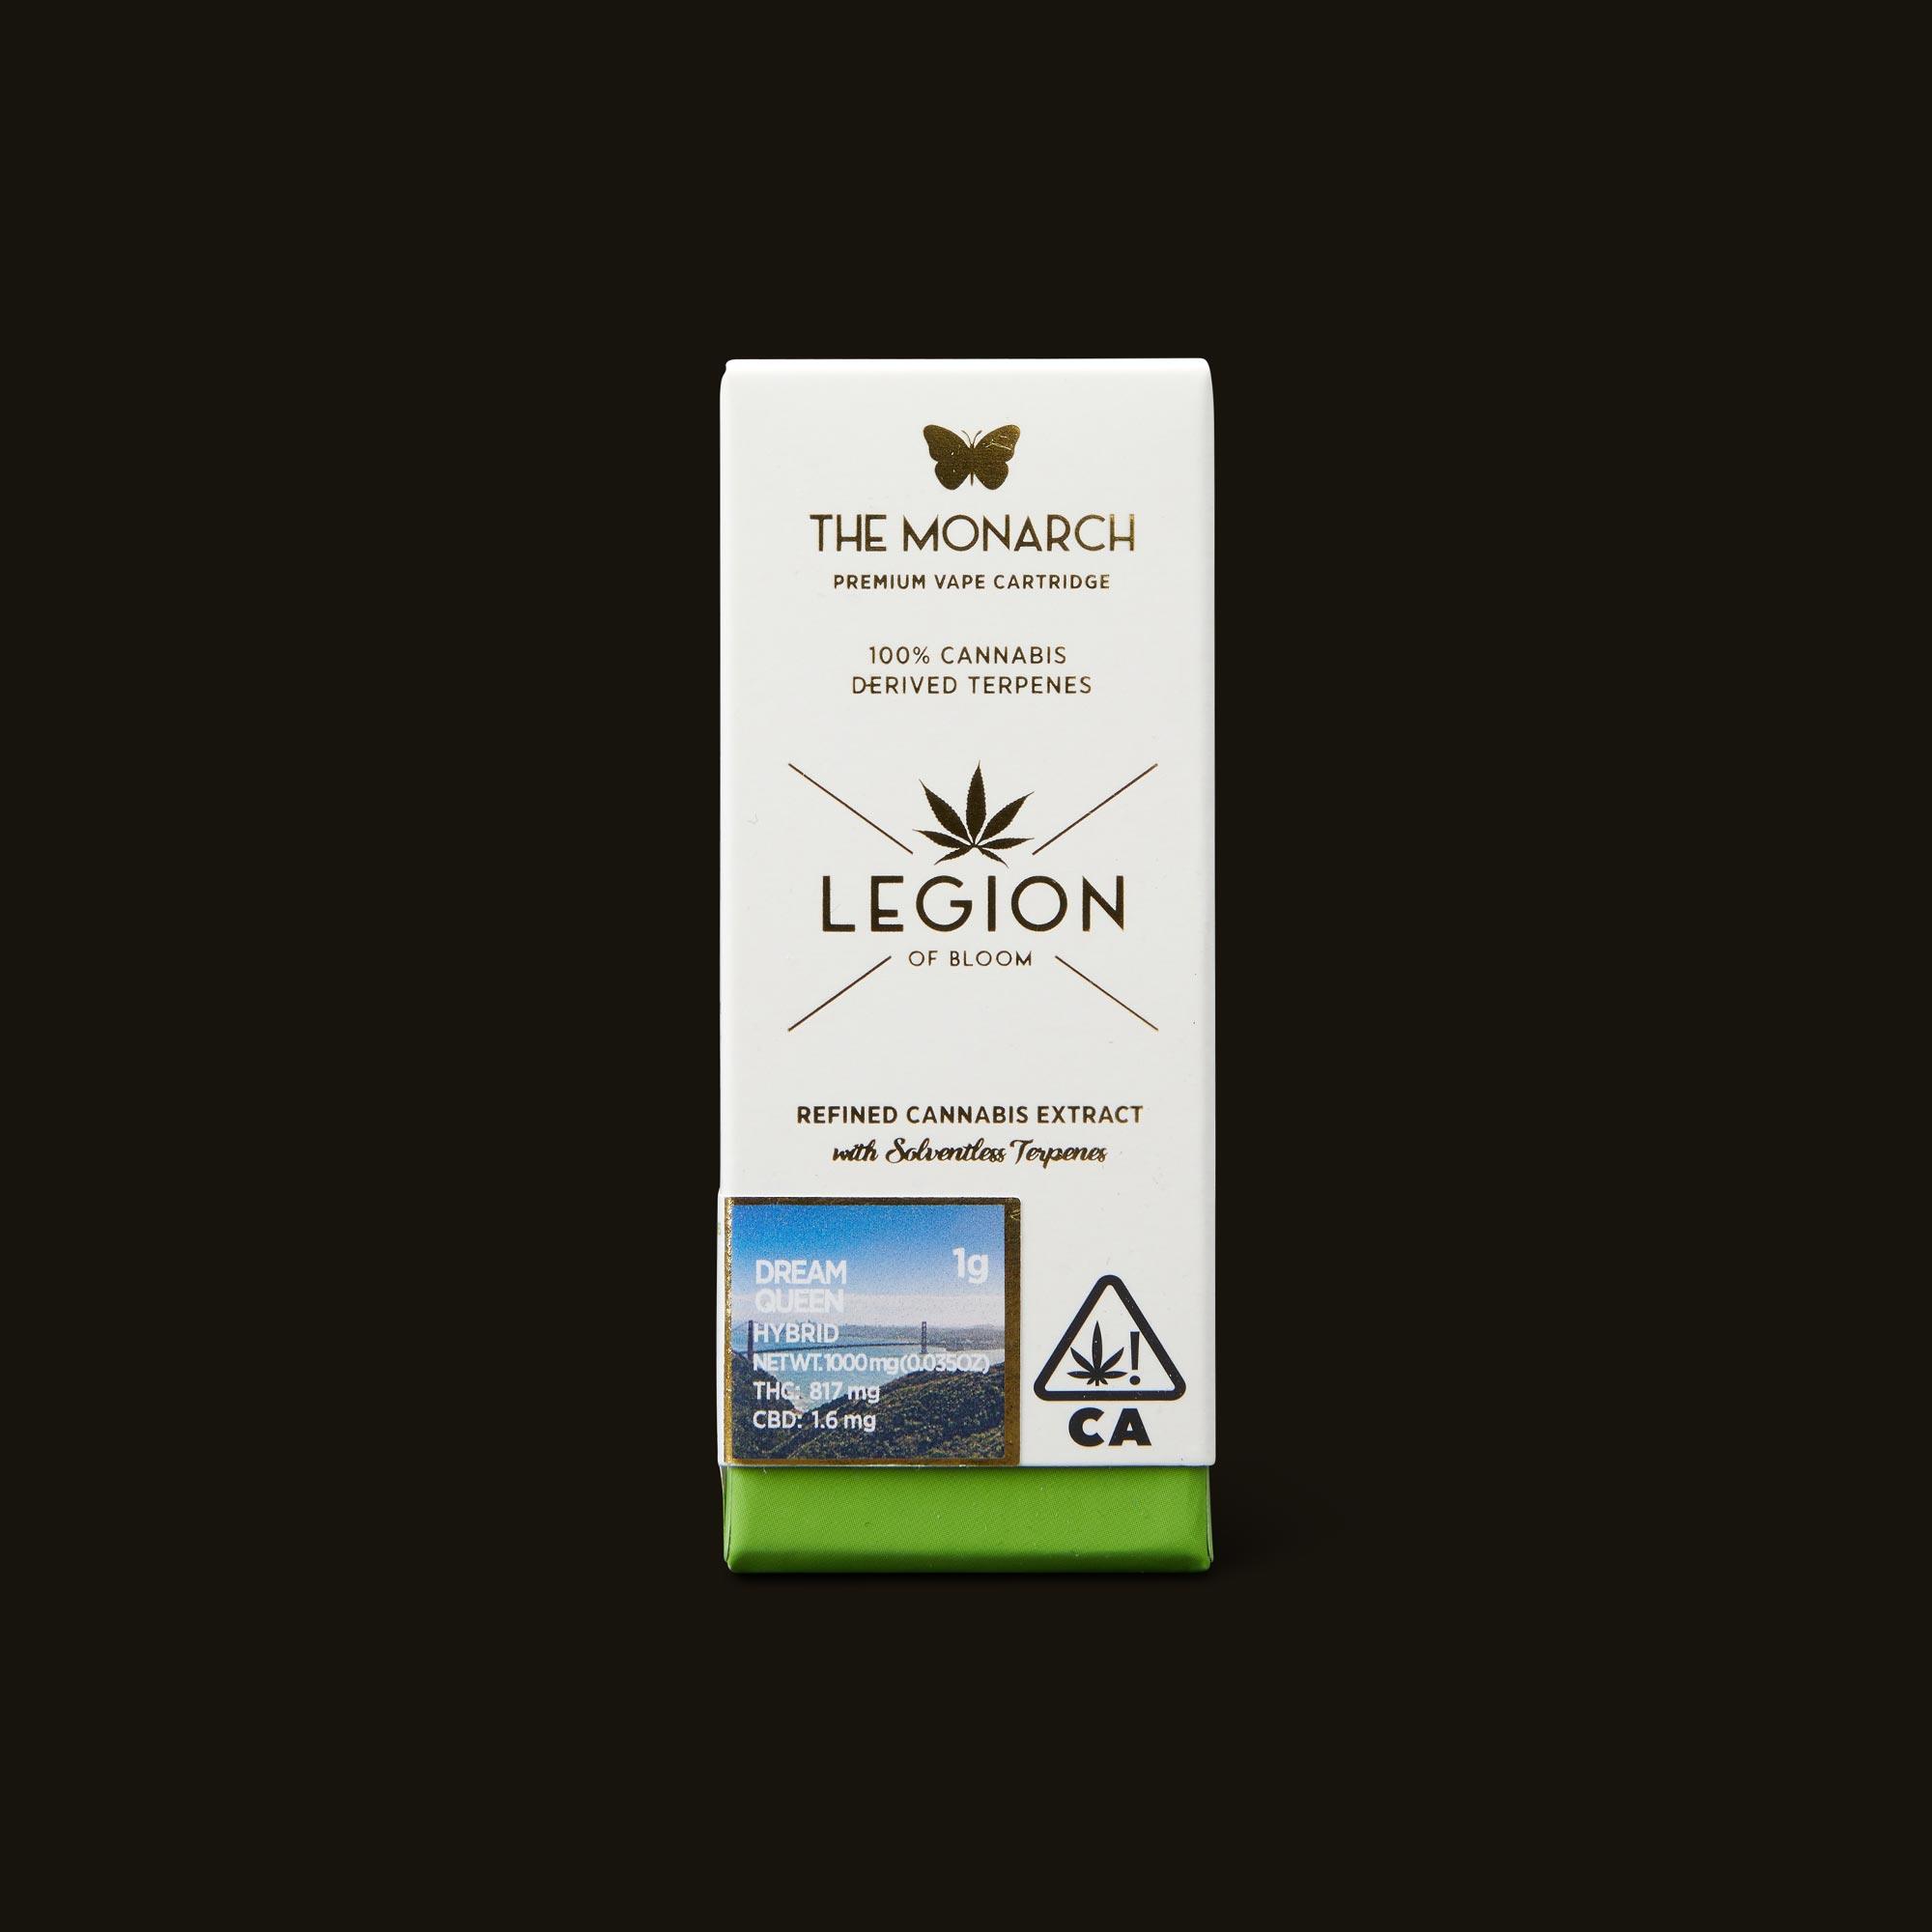 Legion of Bloom Dream Queen Monarch Front Packaging